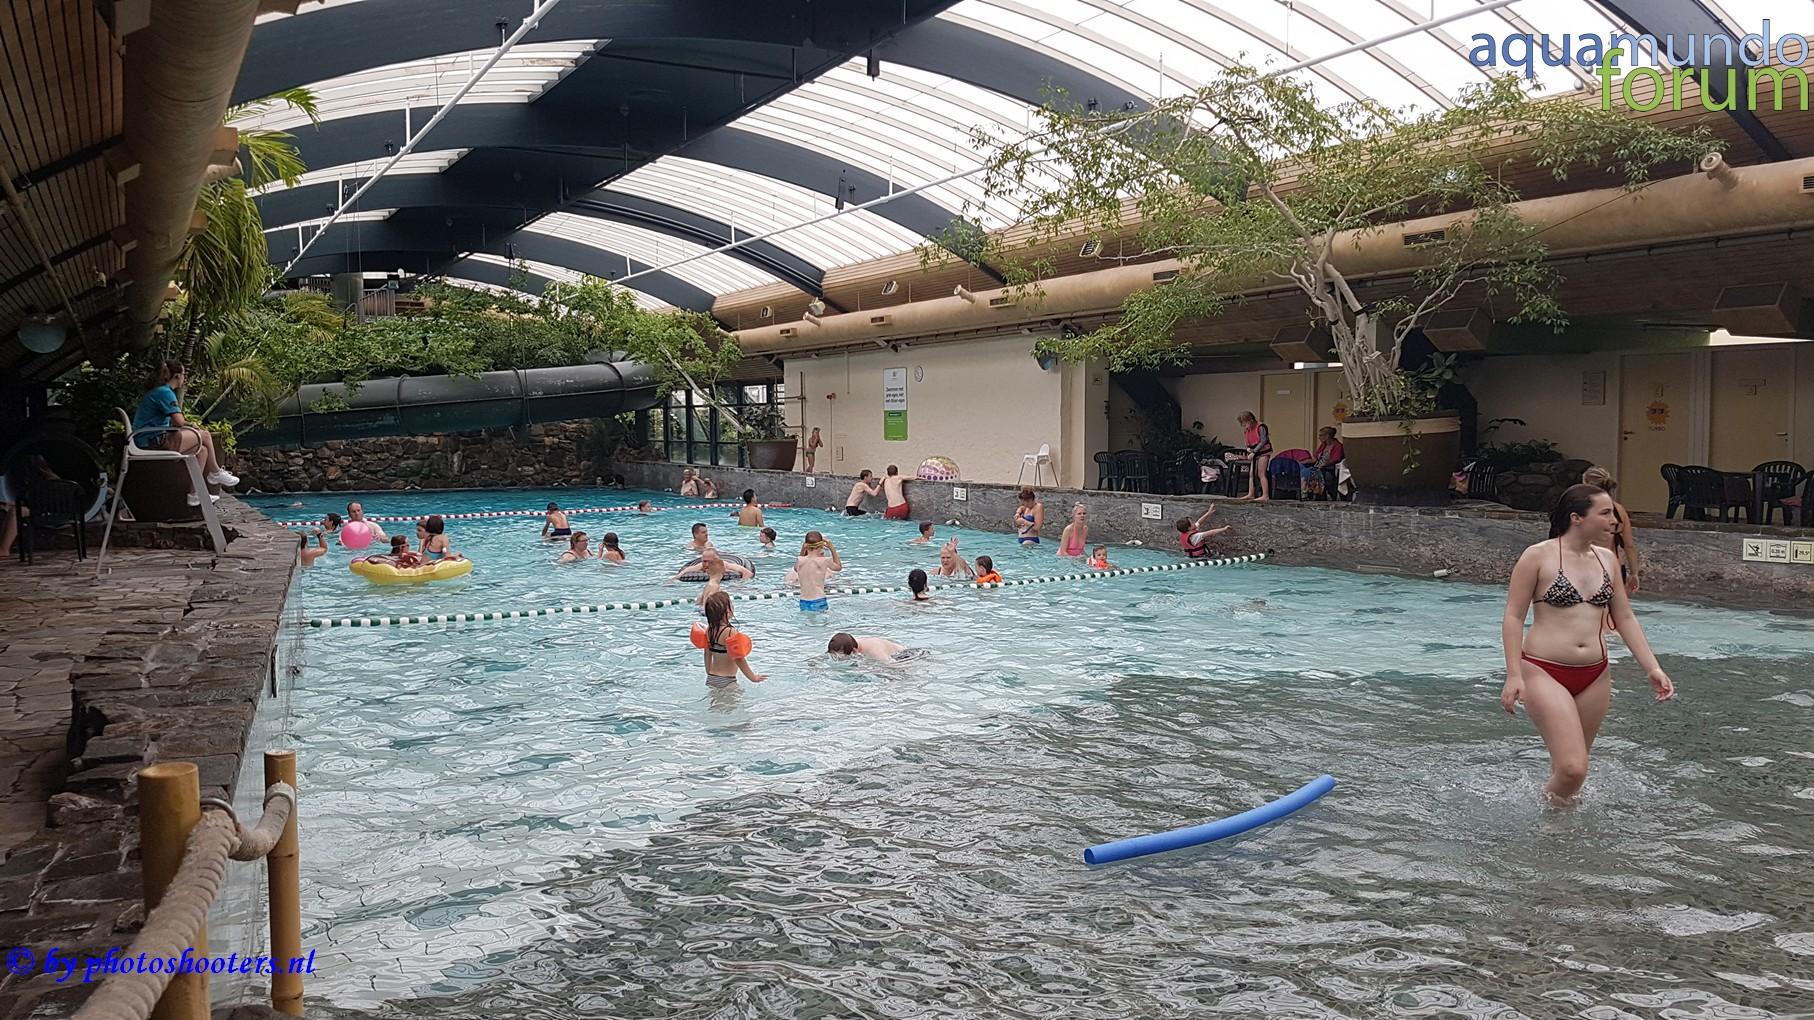 Aqua Mundo Center Parcs Het Meerdal (3).jpg